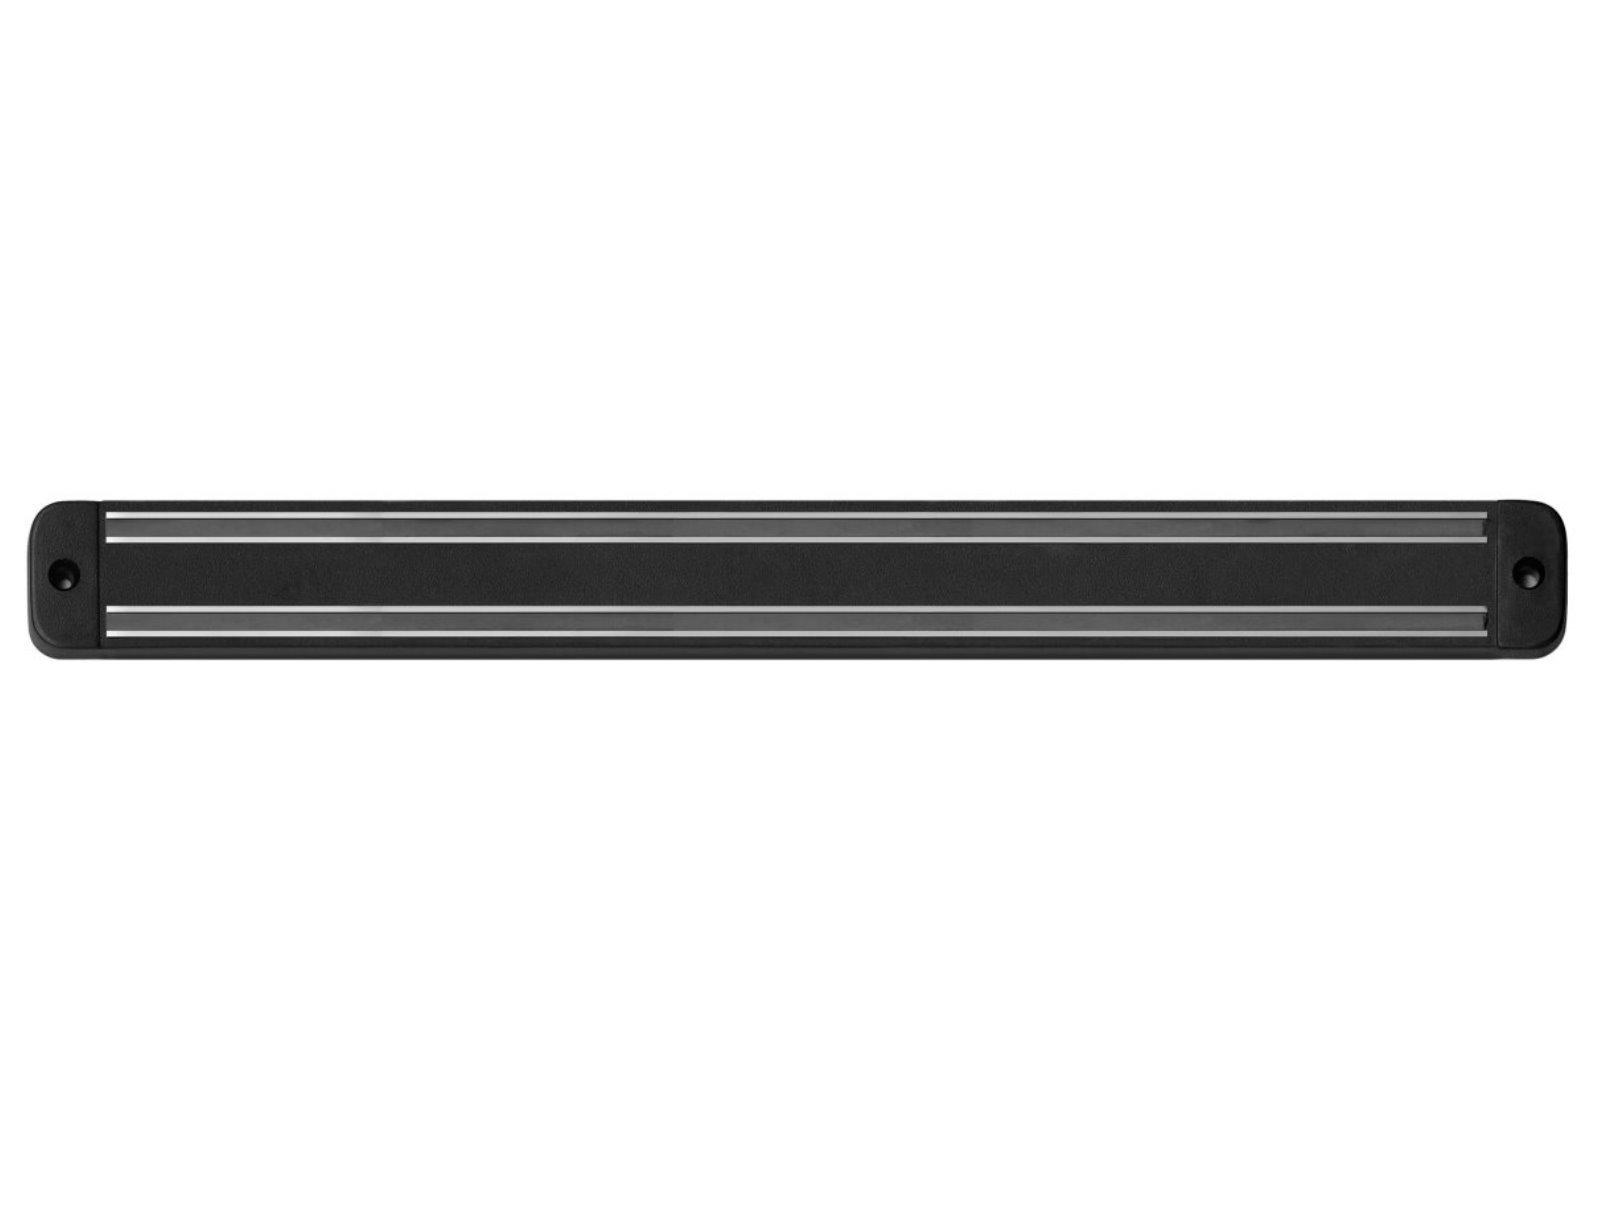 magnetleiste messerhalter messerleiste magnet leiste. Black Bedroom Furniture Sets. Home Design Ideas